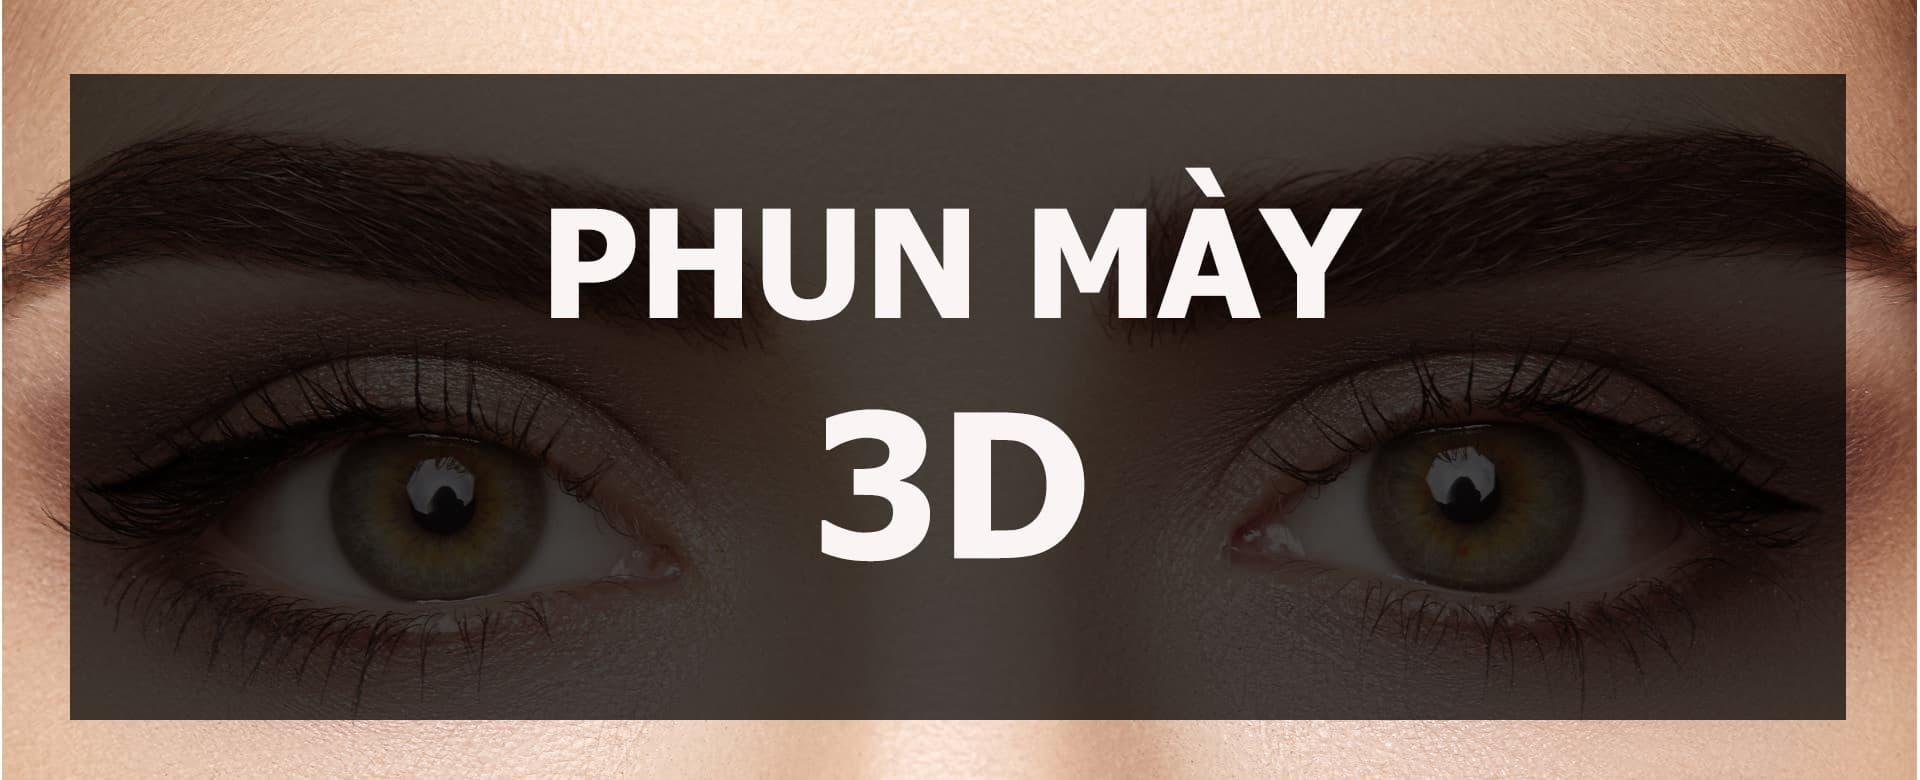 Phun may 3d la gi